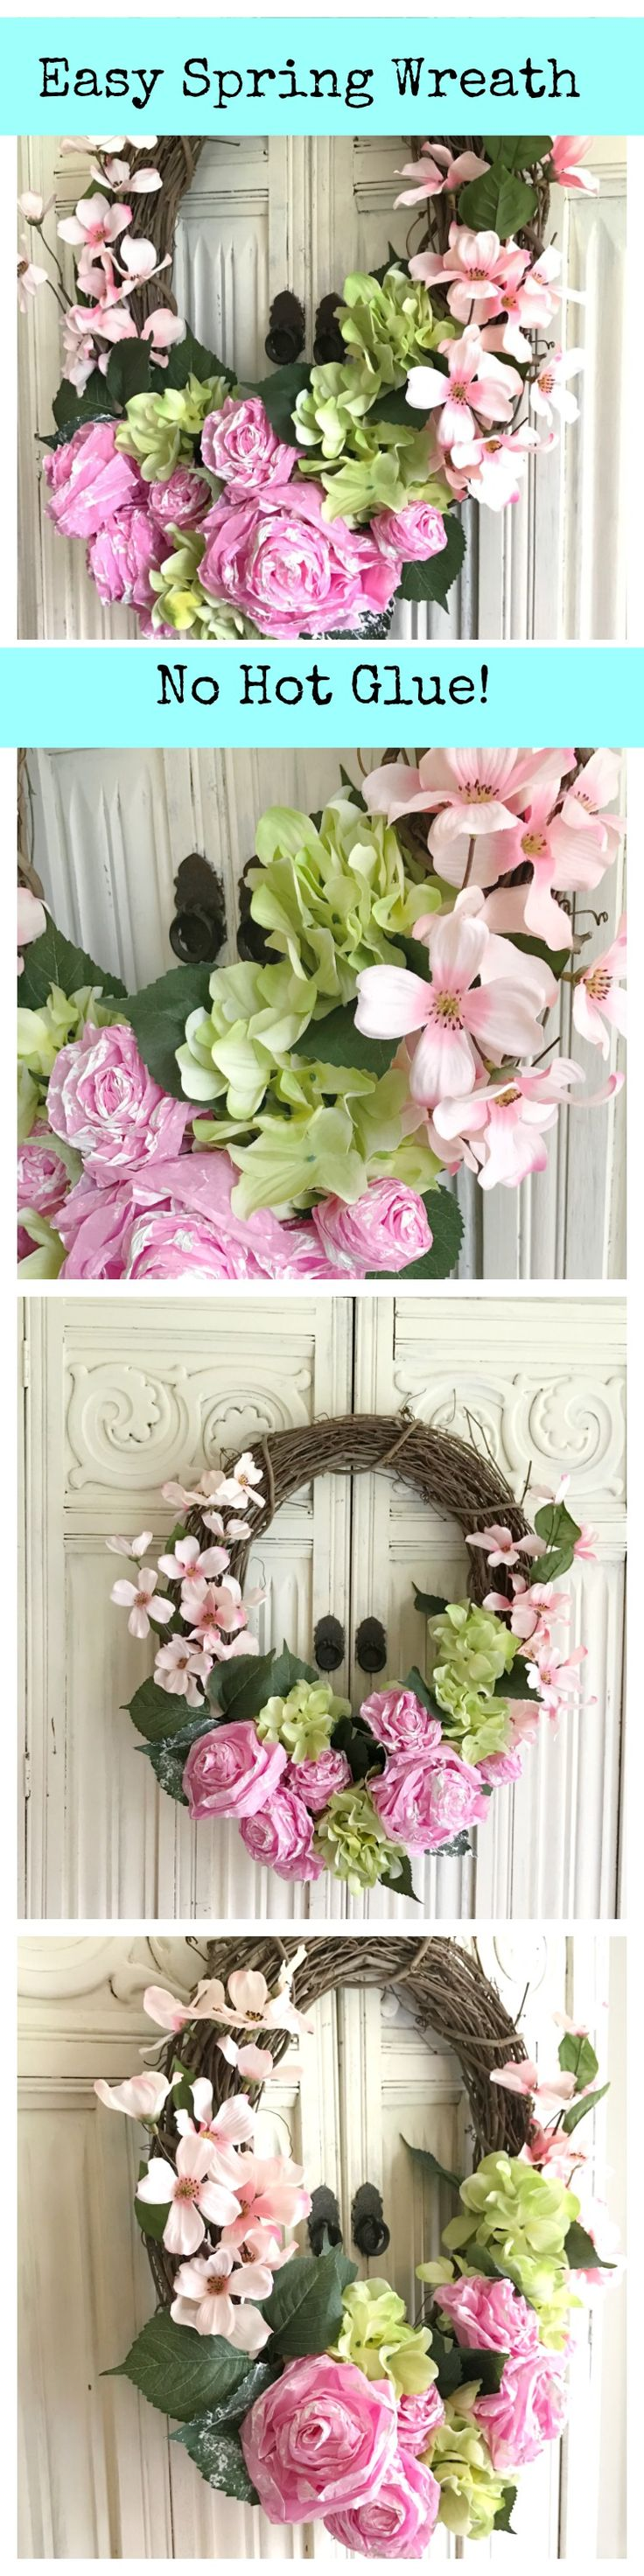 Diy paper flower wreath ruffled - Diy Tissue Paper Flower Wreath